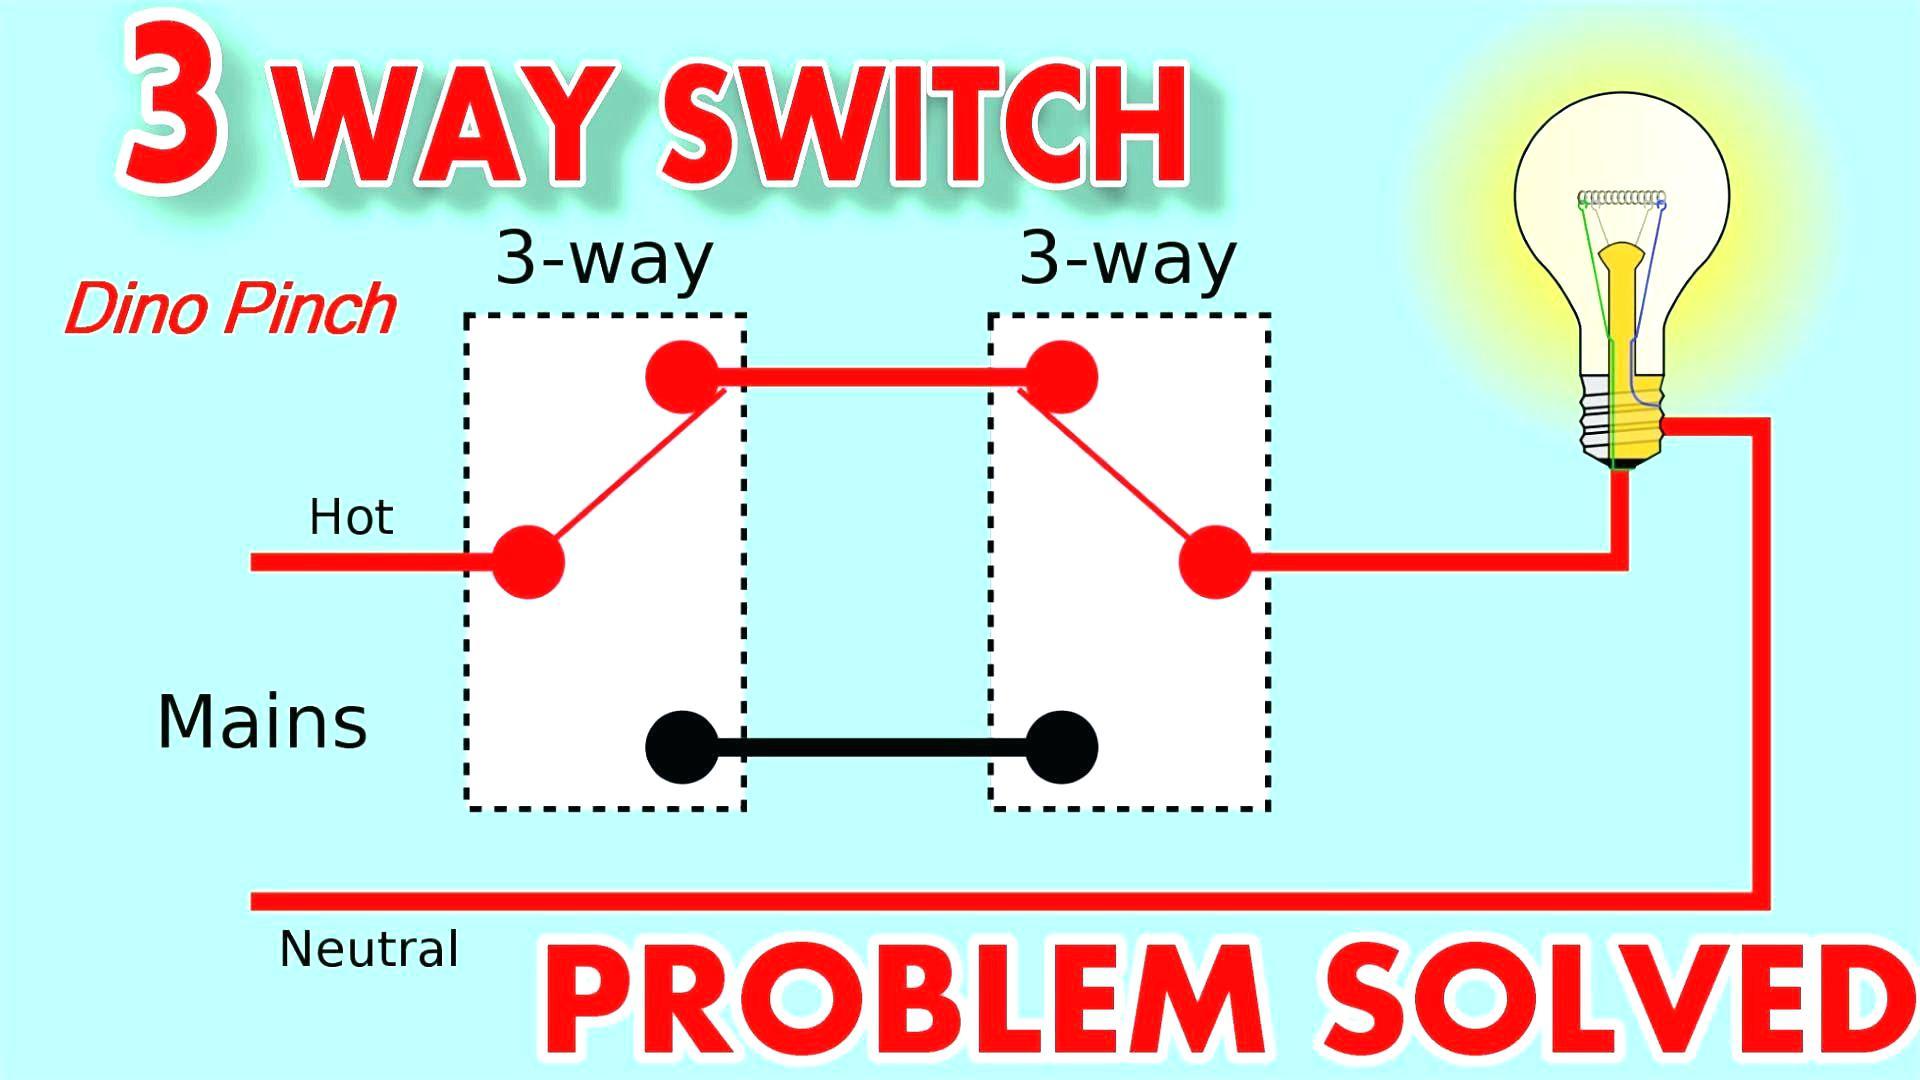 Lutron 3 Way Dimmer Switch Wiring Diagram - Lorestan - 3 Way Dimmer Switch Wiring Diagram